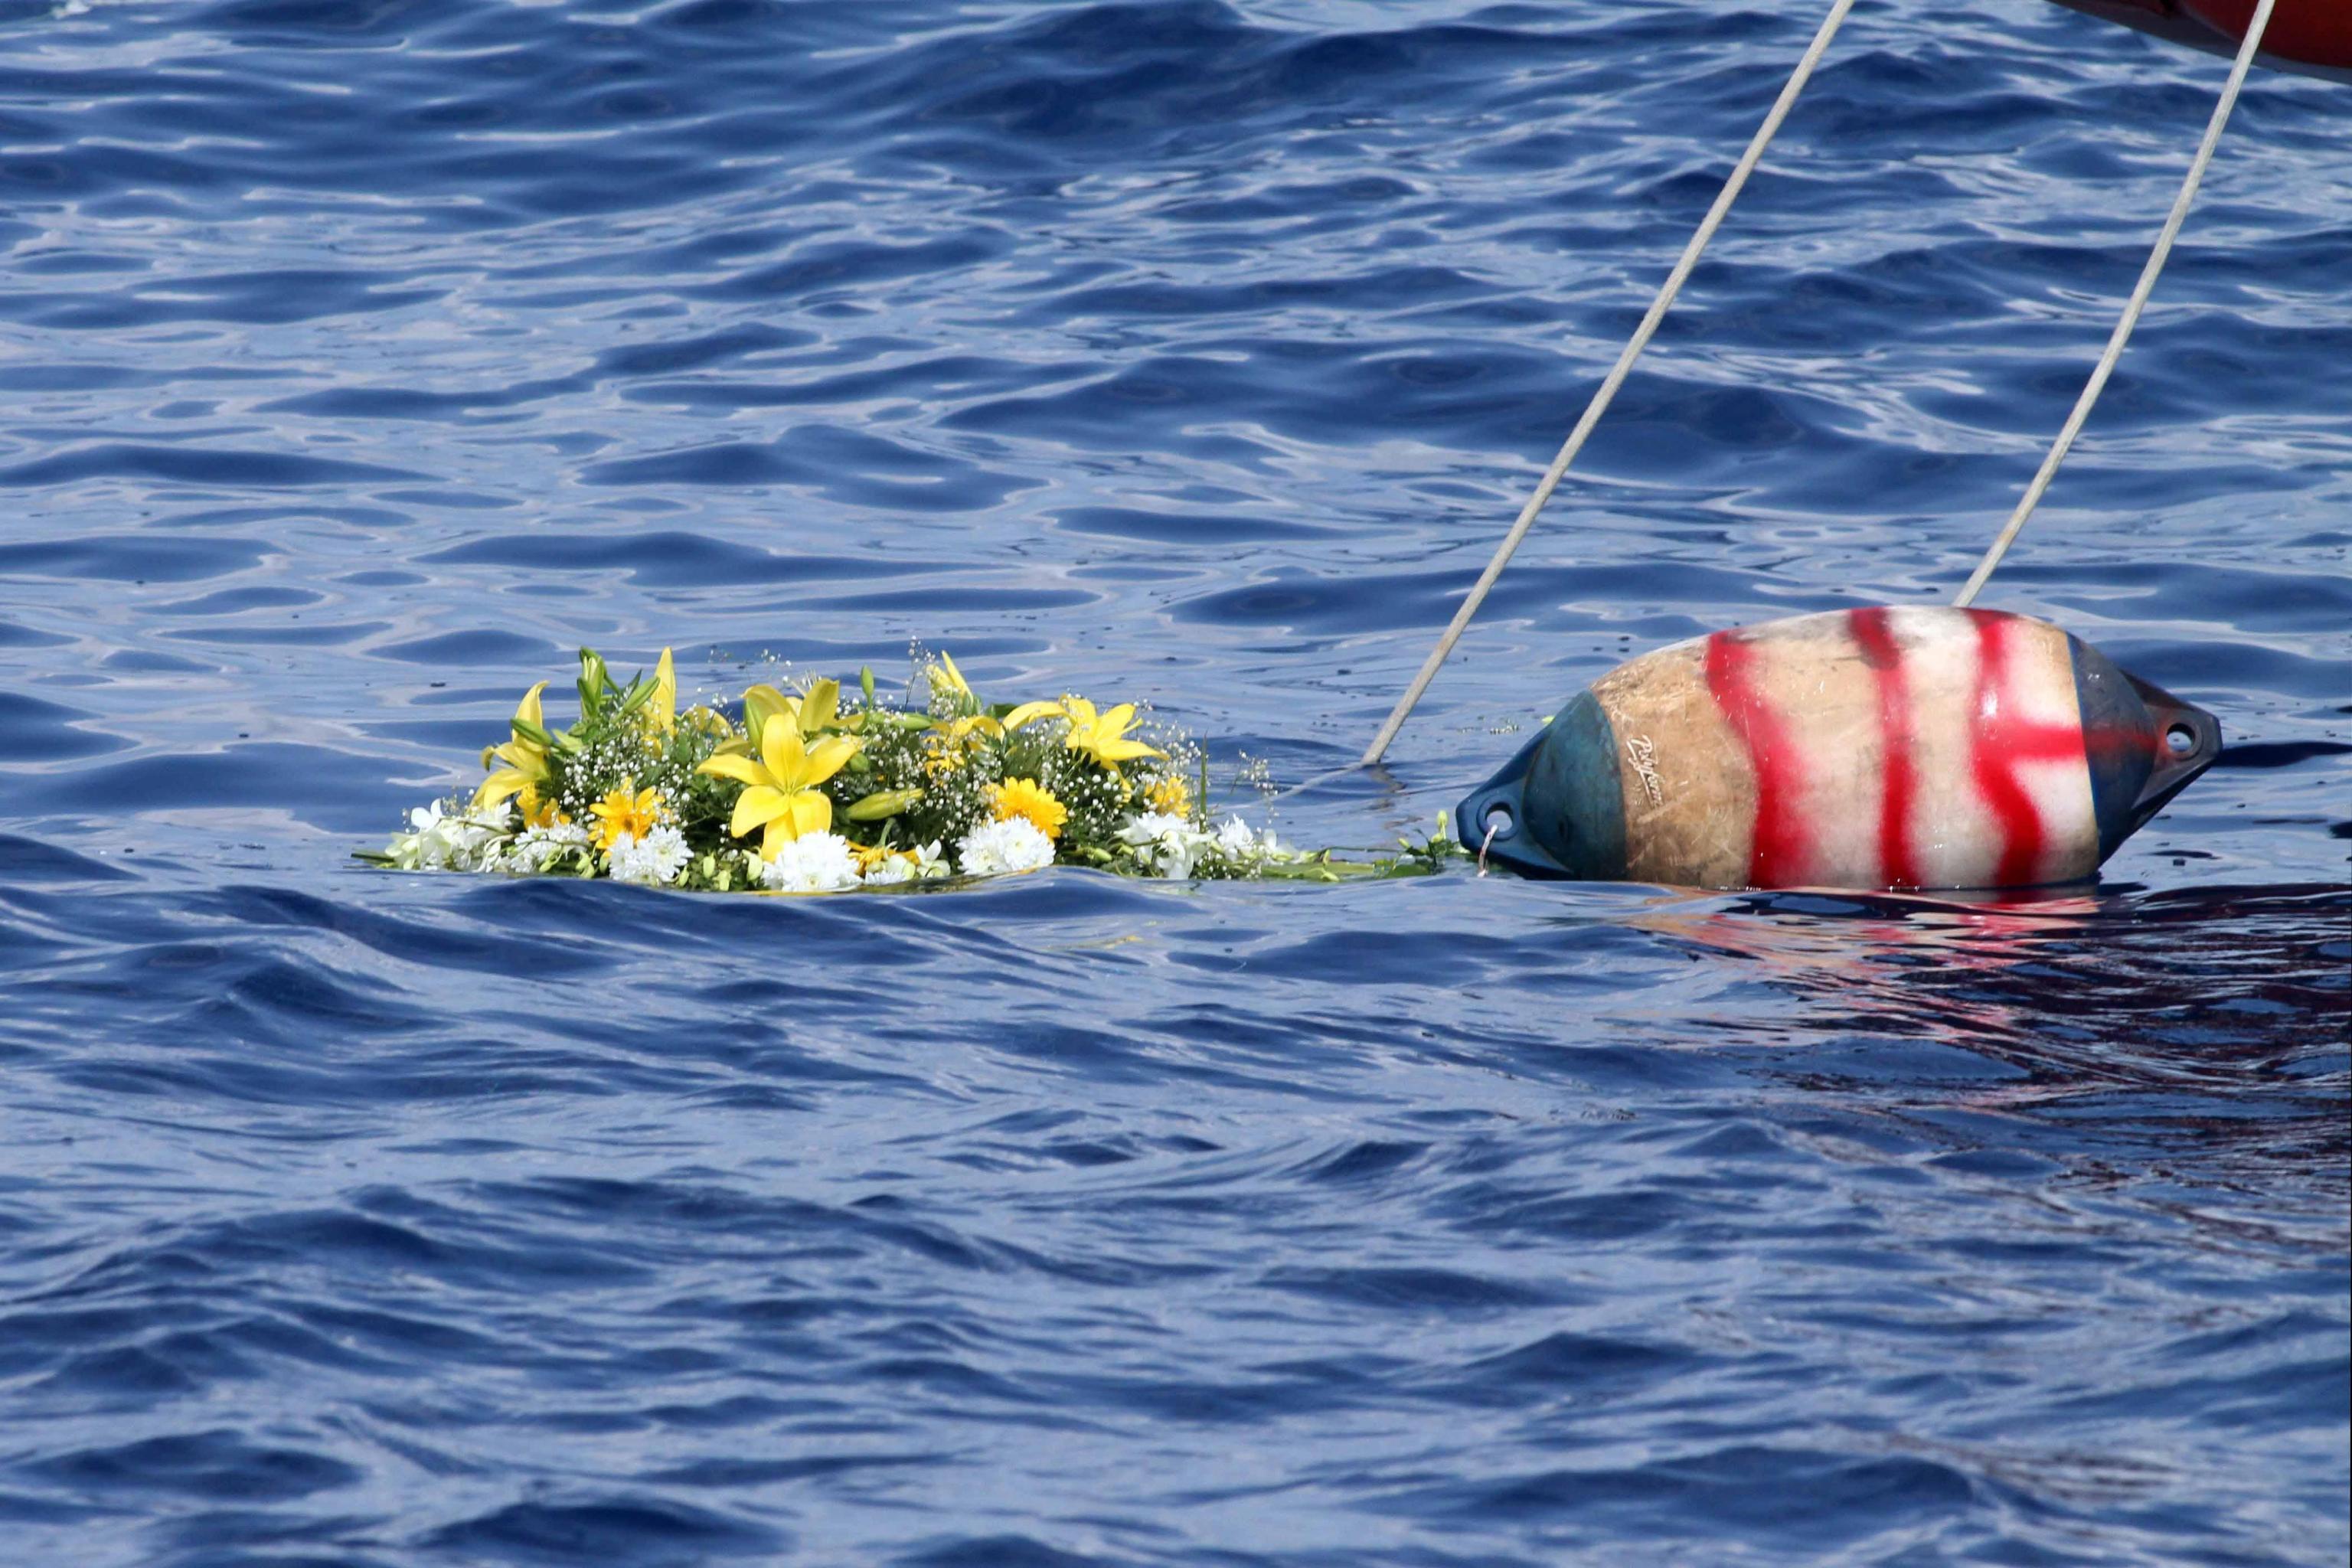 Naufragio Sicilia: recuperati finora 21 cadaveri